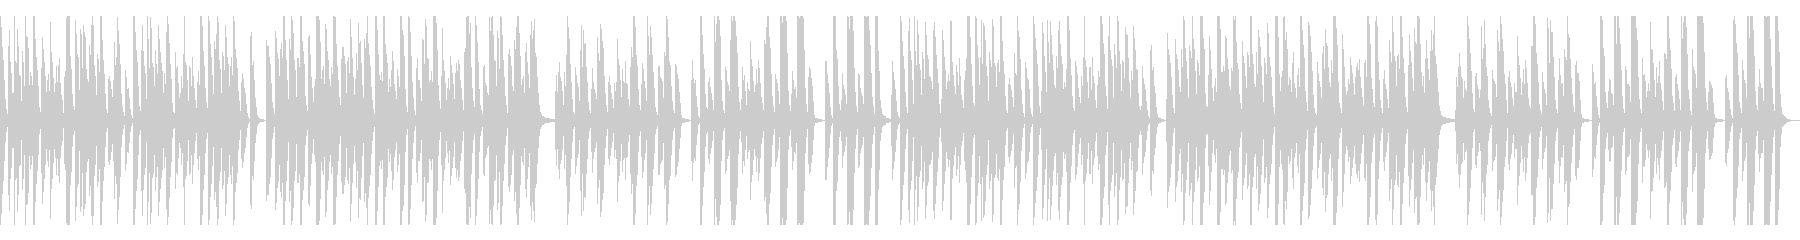 YouTube、トーク、ピアノ、木琴の未再生の波形